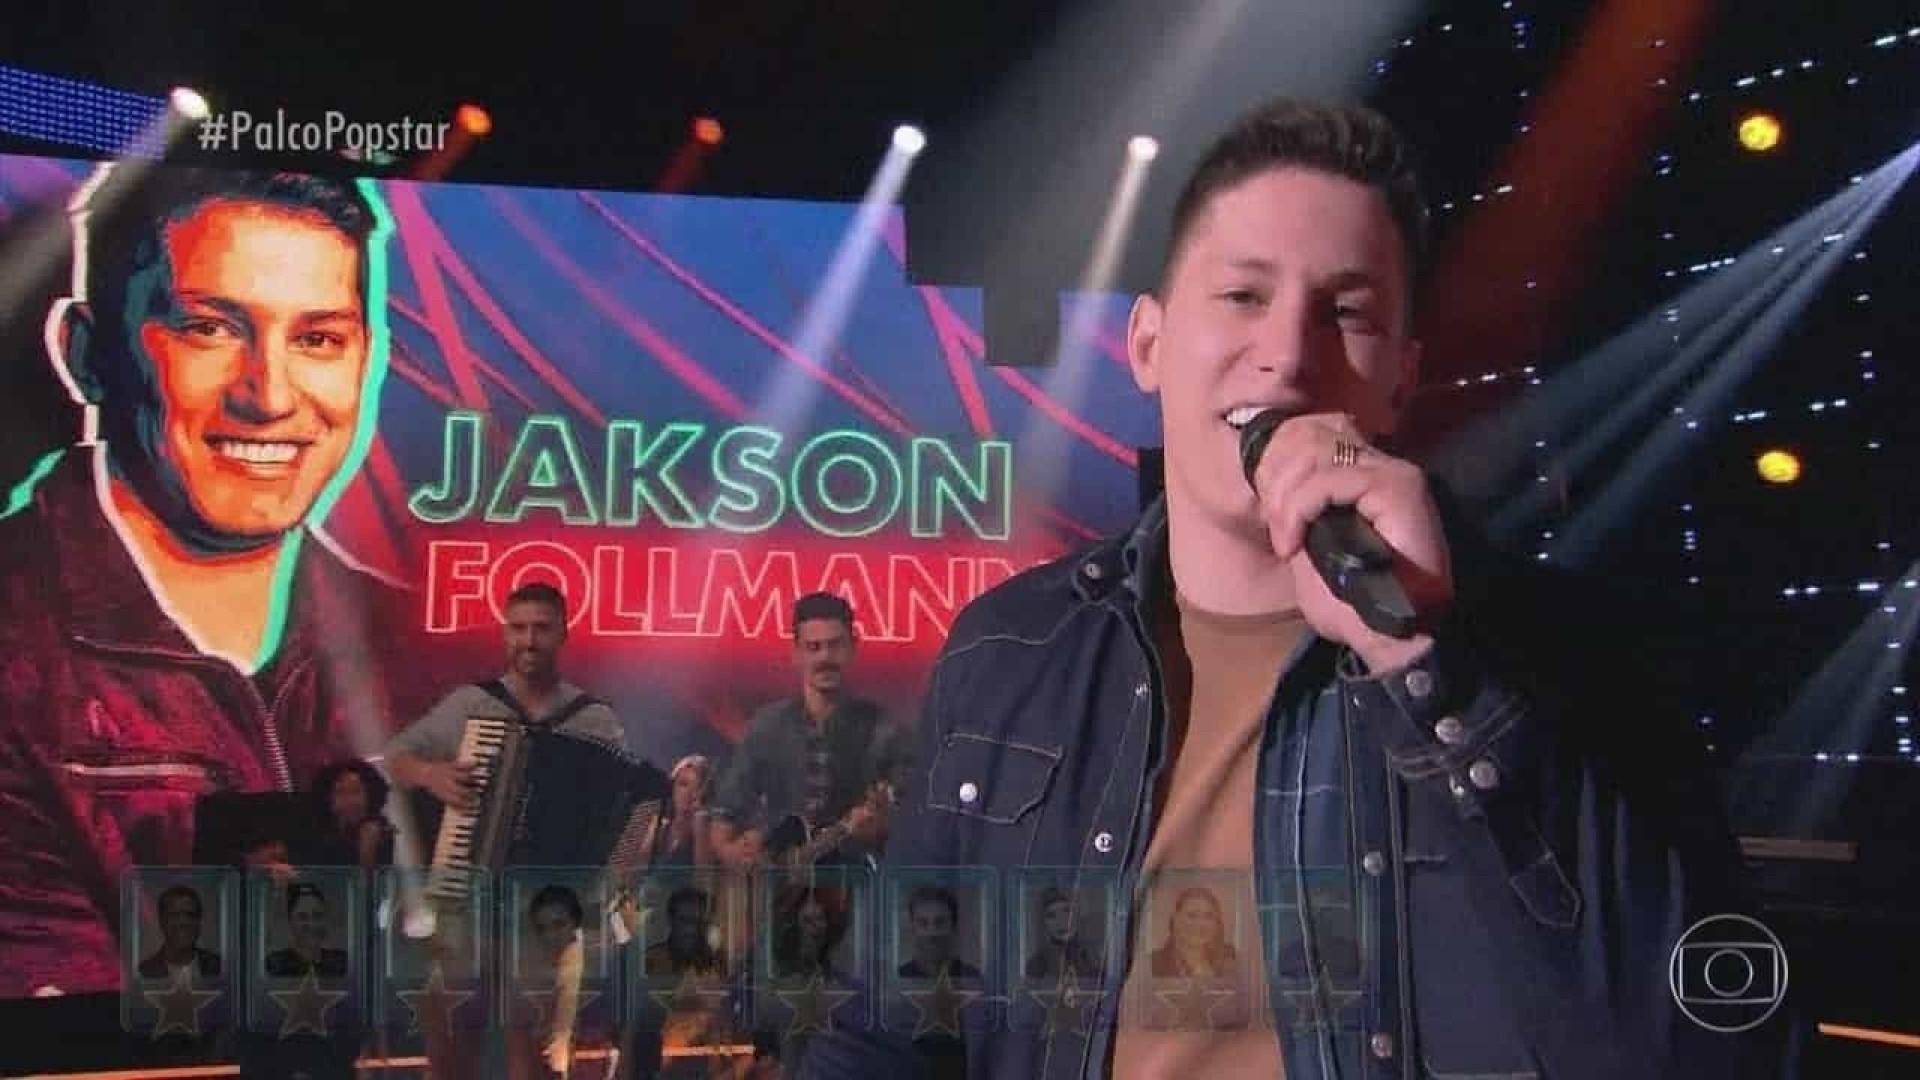 Jakson Follmann vence 3ª temporada do PopStar; Helga fica em 2º